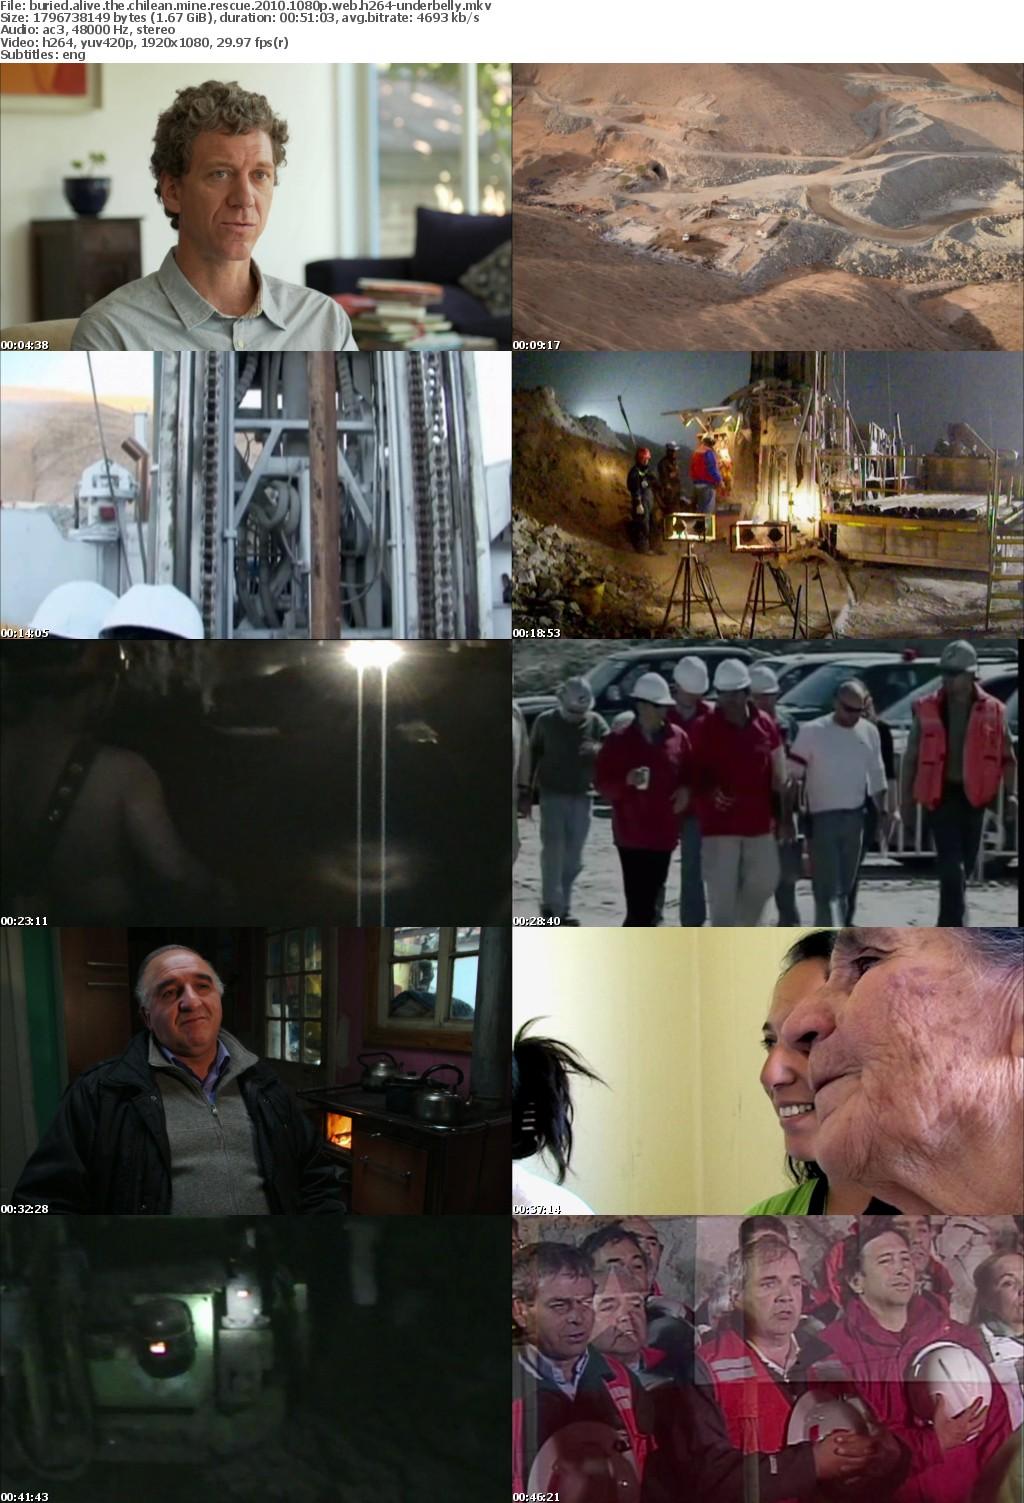 Buried Alive The Chilean Mine Rescue 2010 1080p WEB H264-UNDERBELLY